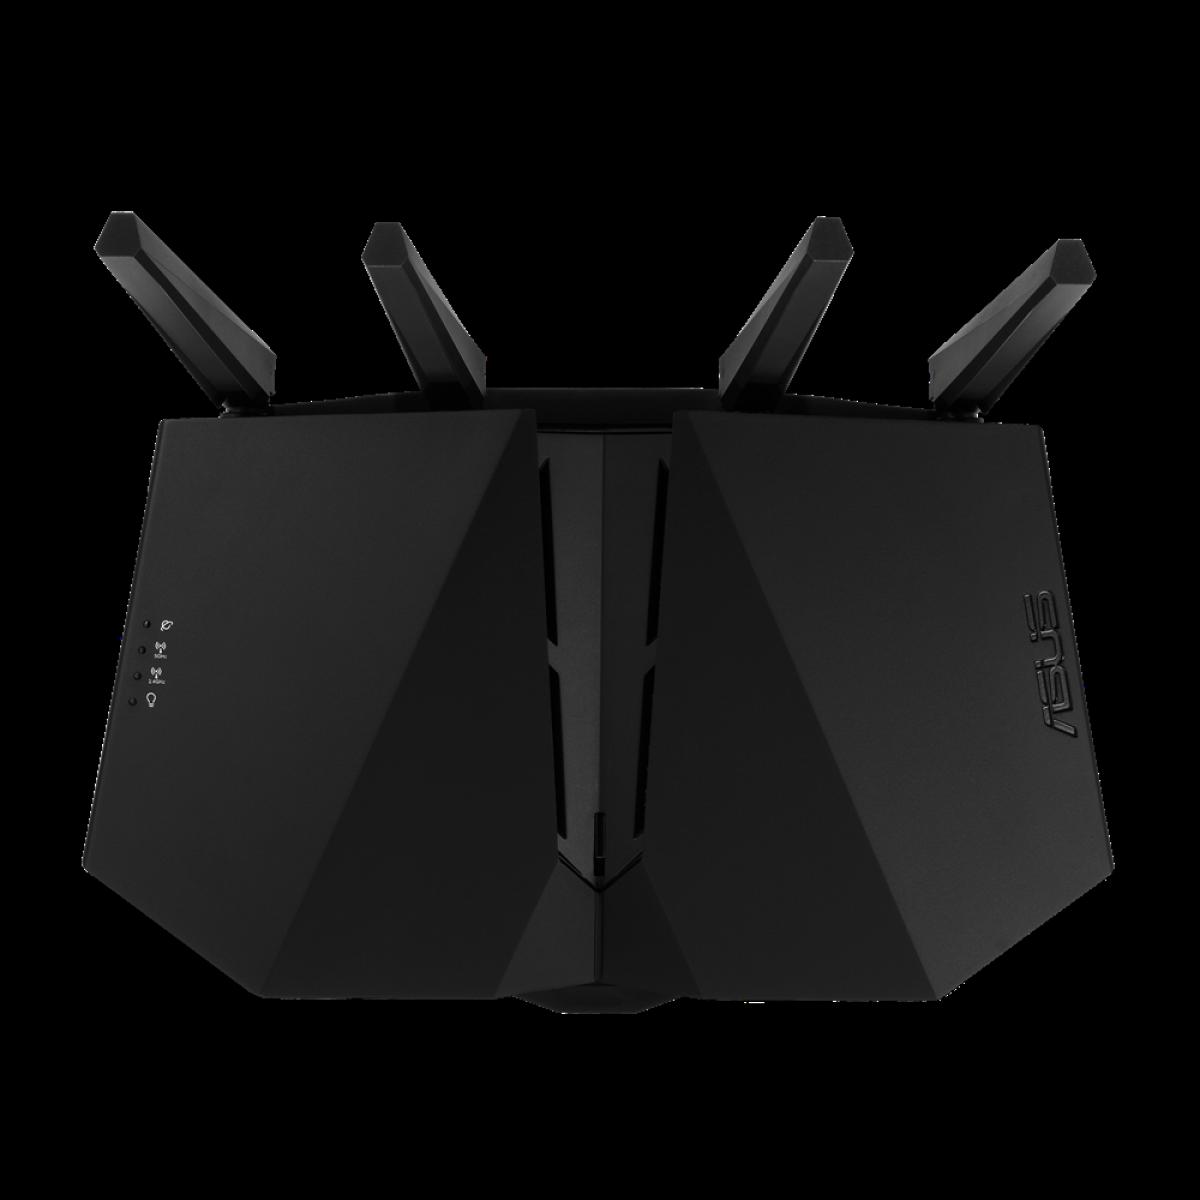 Roteador Asus RT-AX82U, WiFi 6, AX5400, MU-MIMO, 90IG05G0-MO3R10